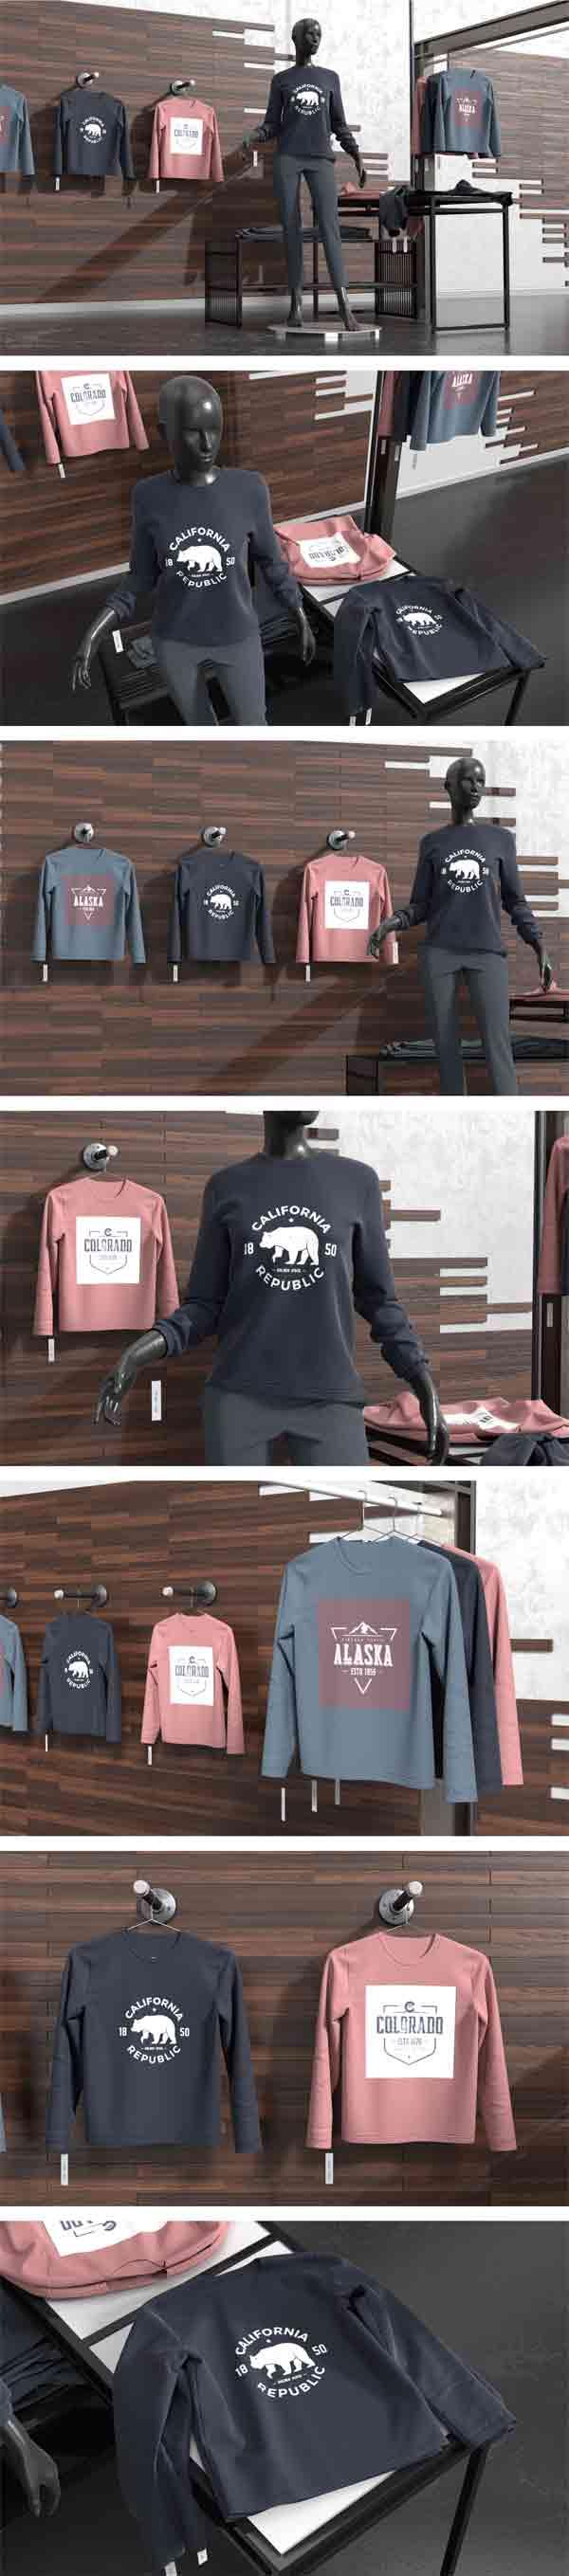 apparel_branding_template_examples_600.jpg